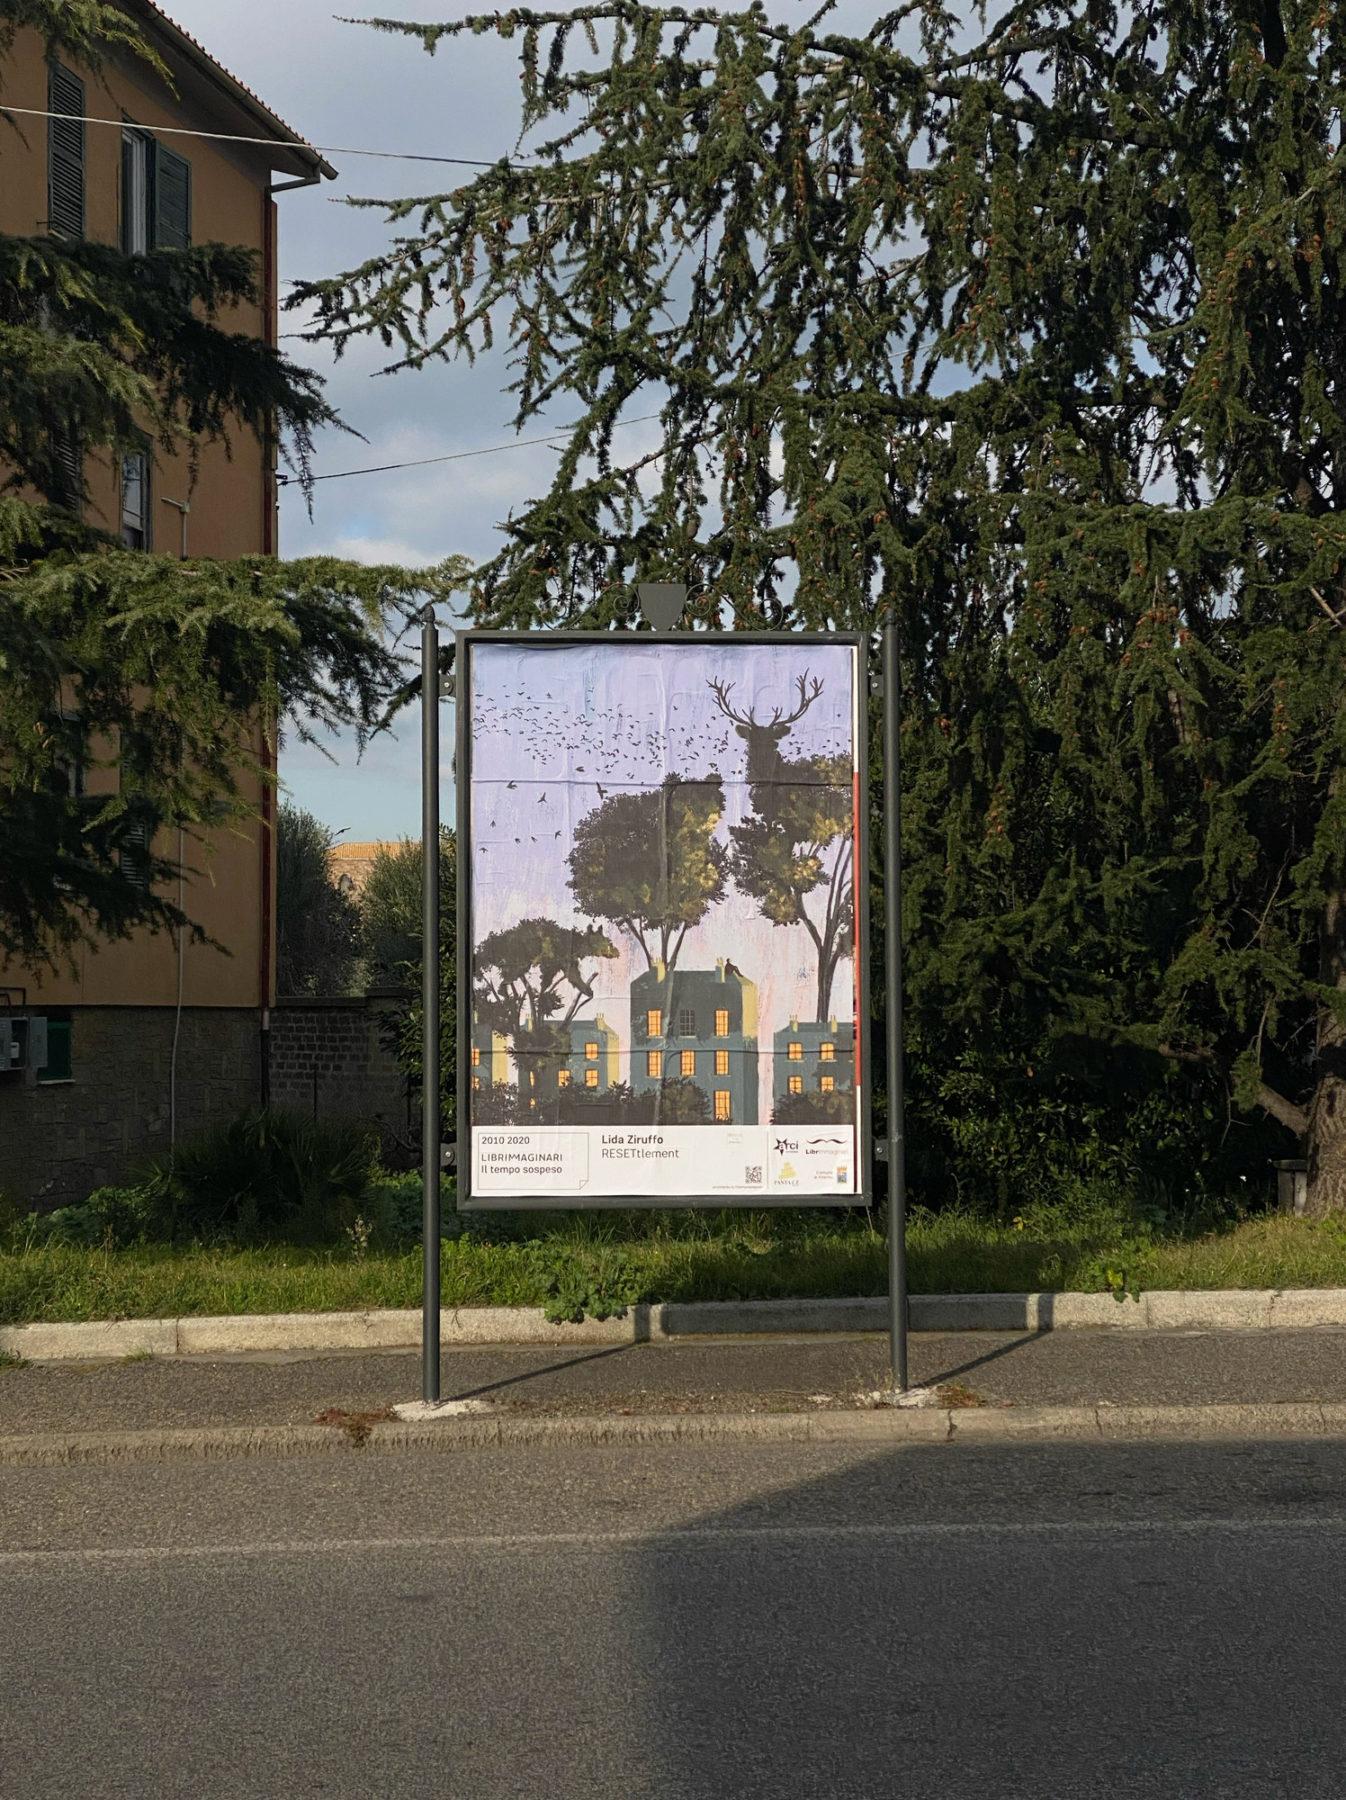 Lida Ziruffo  RESETtlement  ph Chiara Ernandes